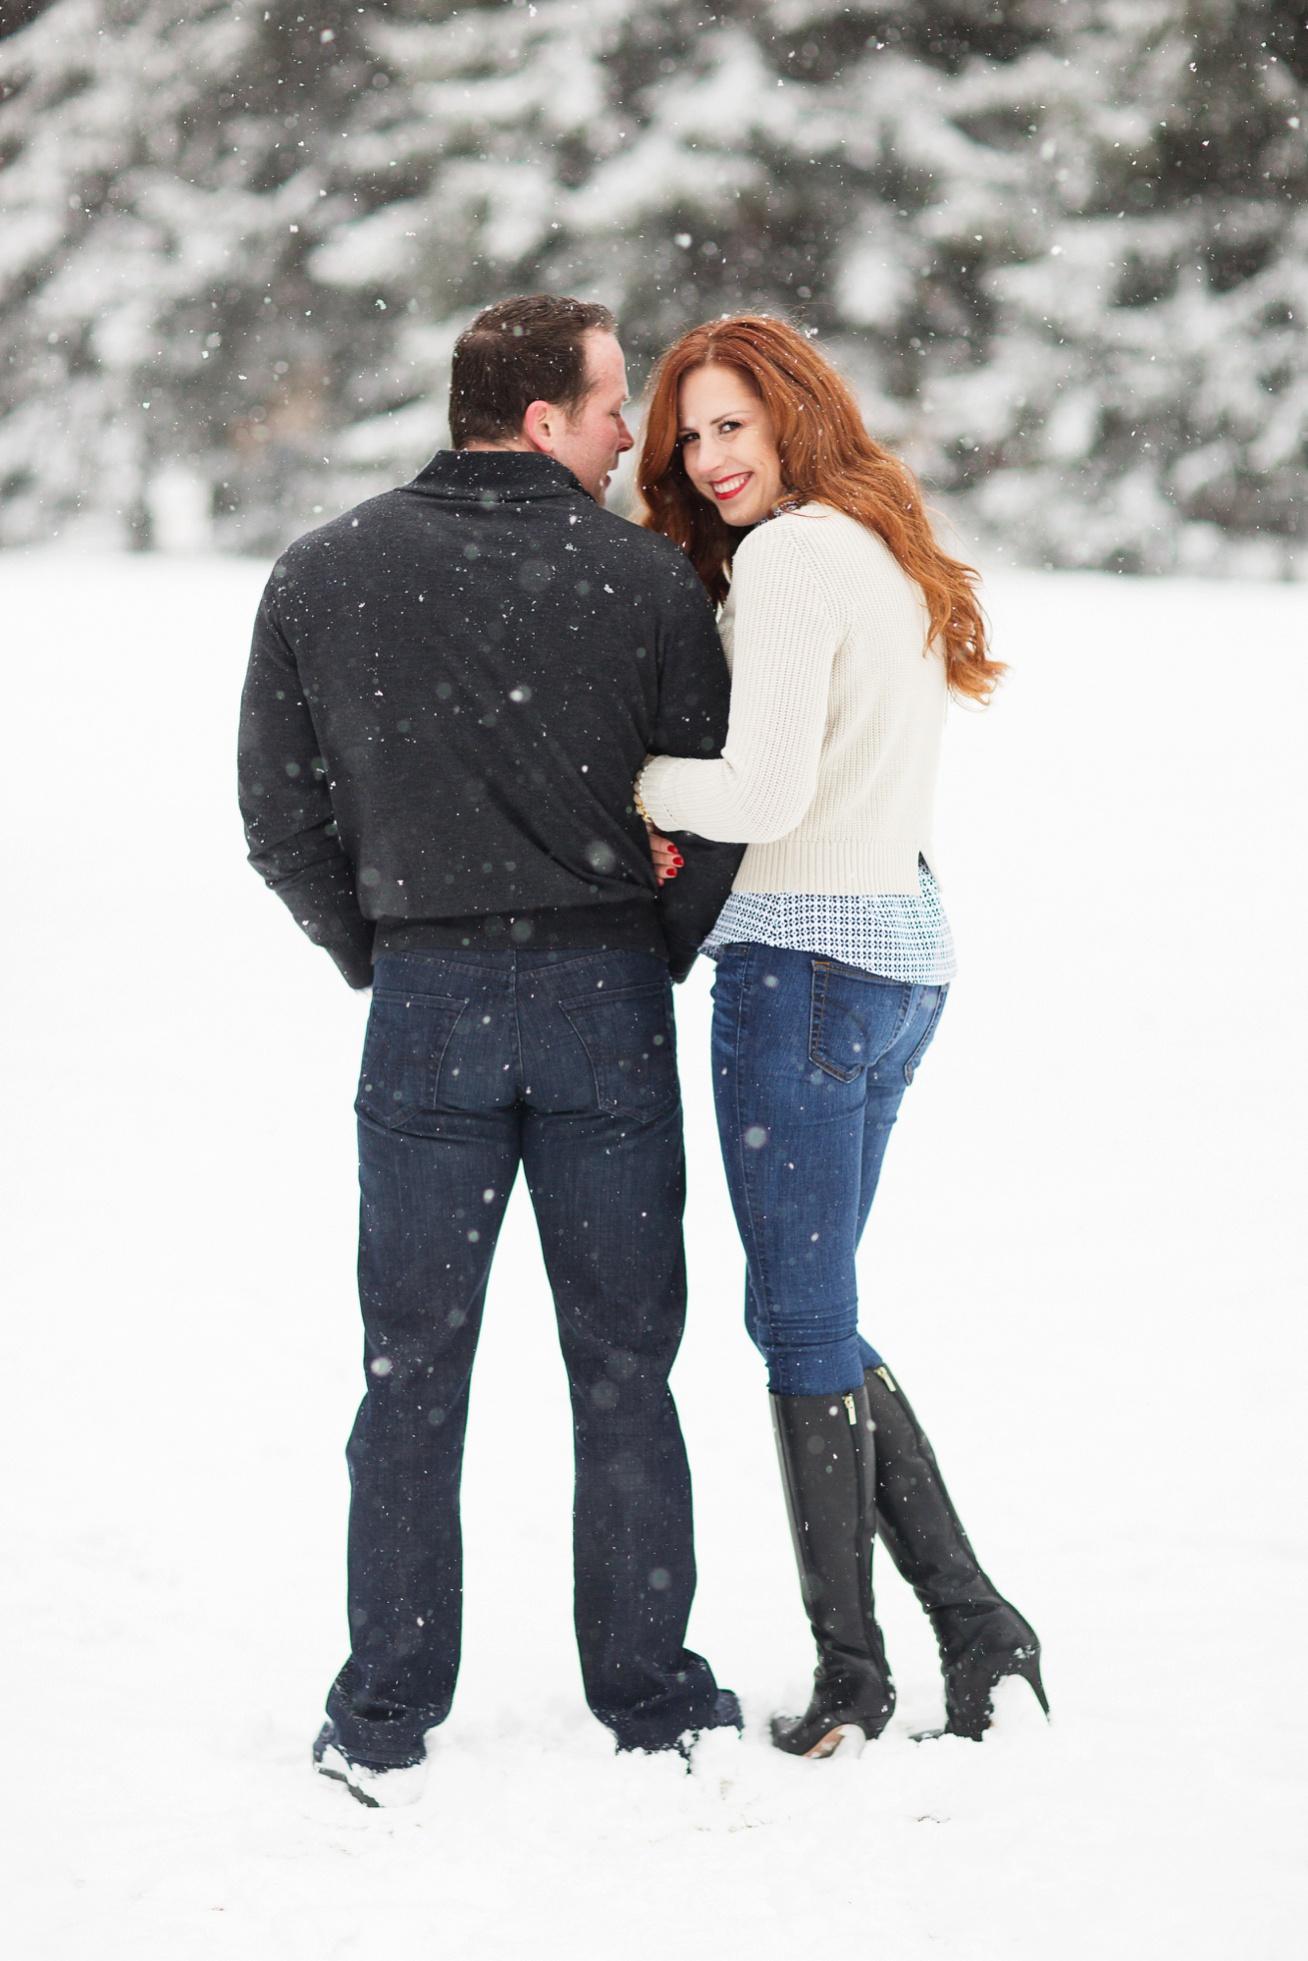 Snowy Engagement Session in Aspen / Aspen wedding Photographer Cat Mayer Studio